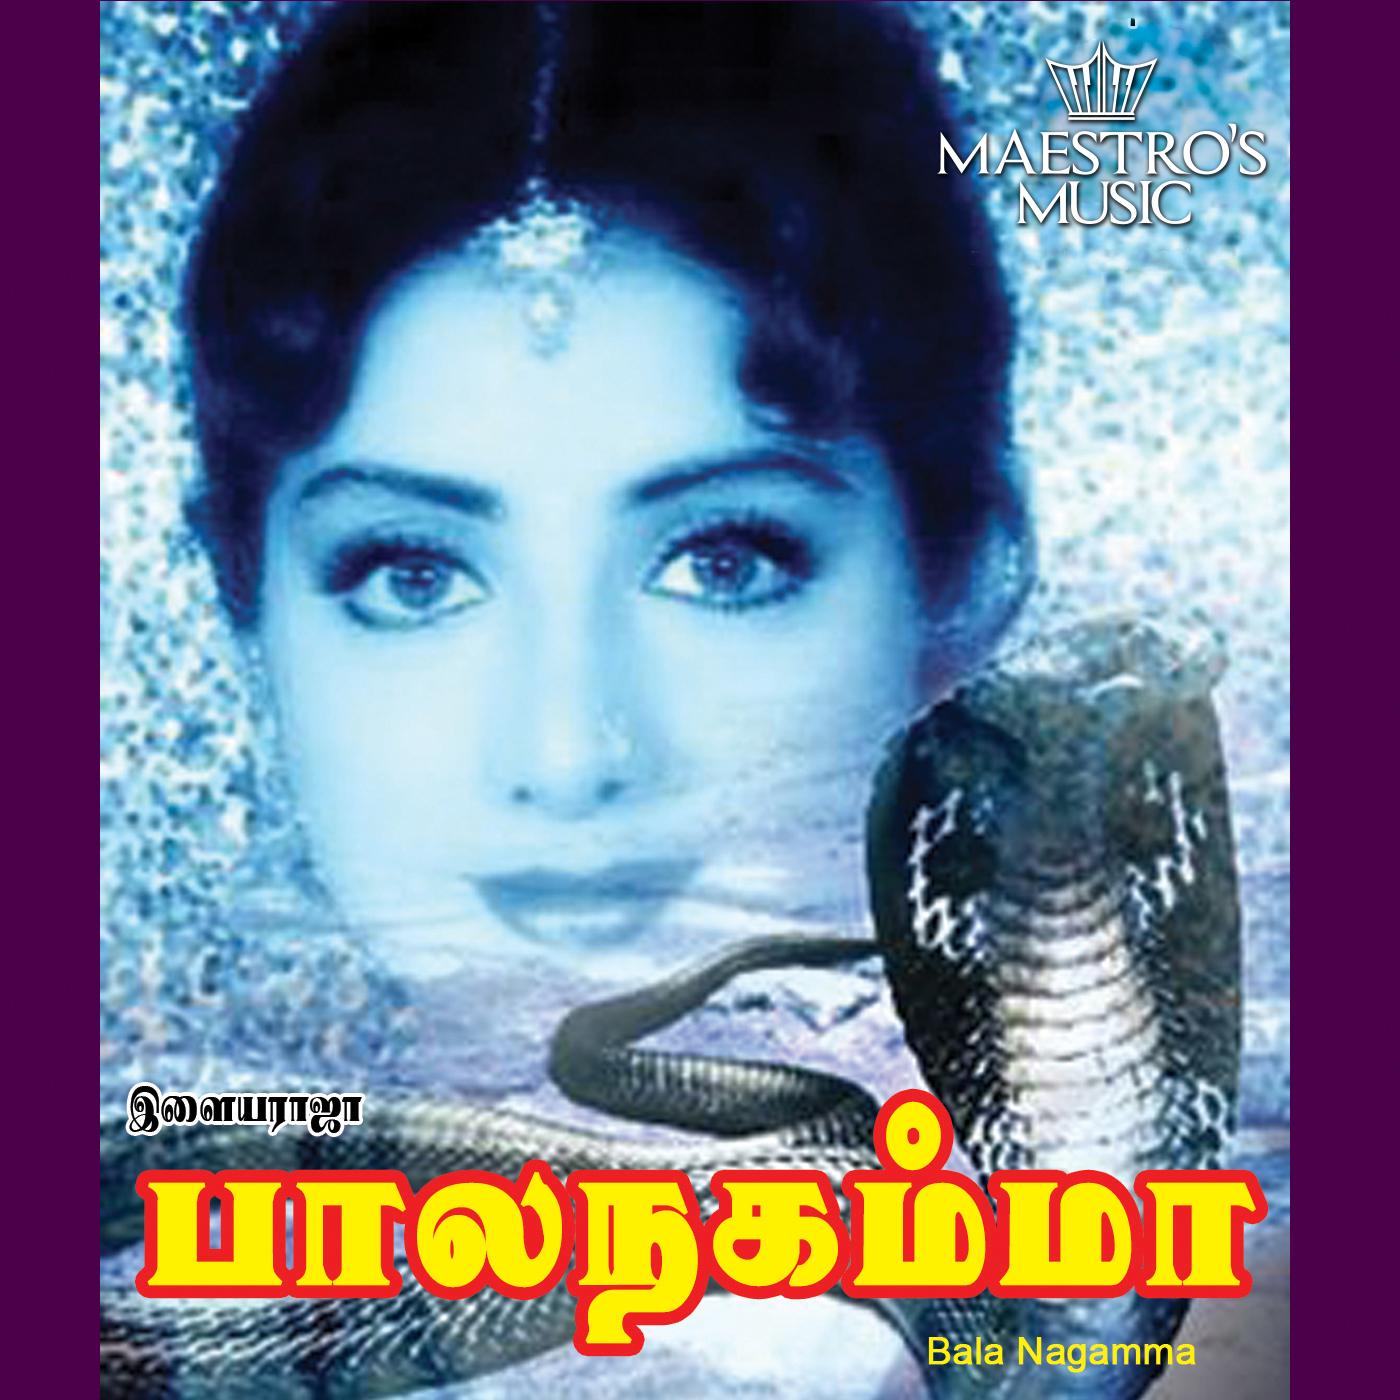 Balanagamma ((1981))